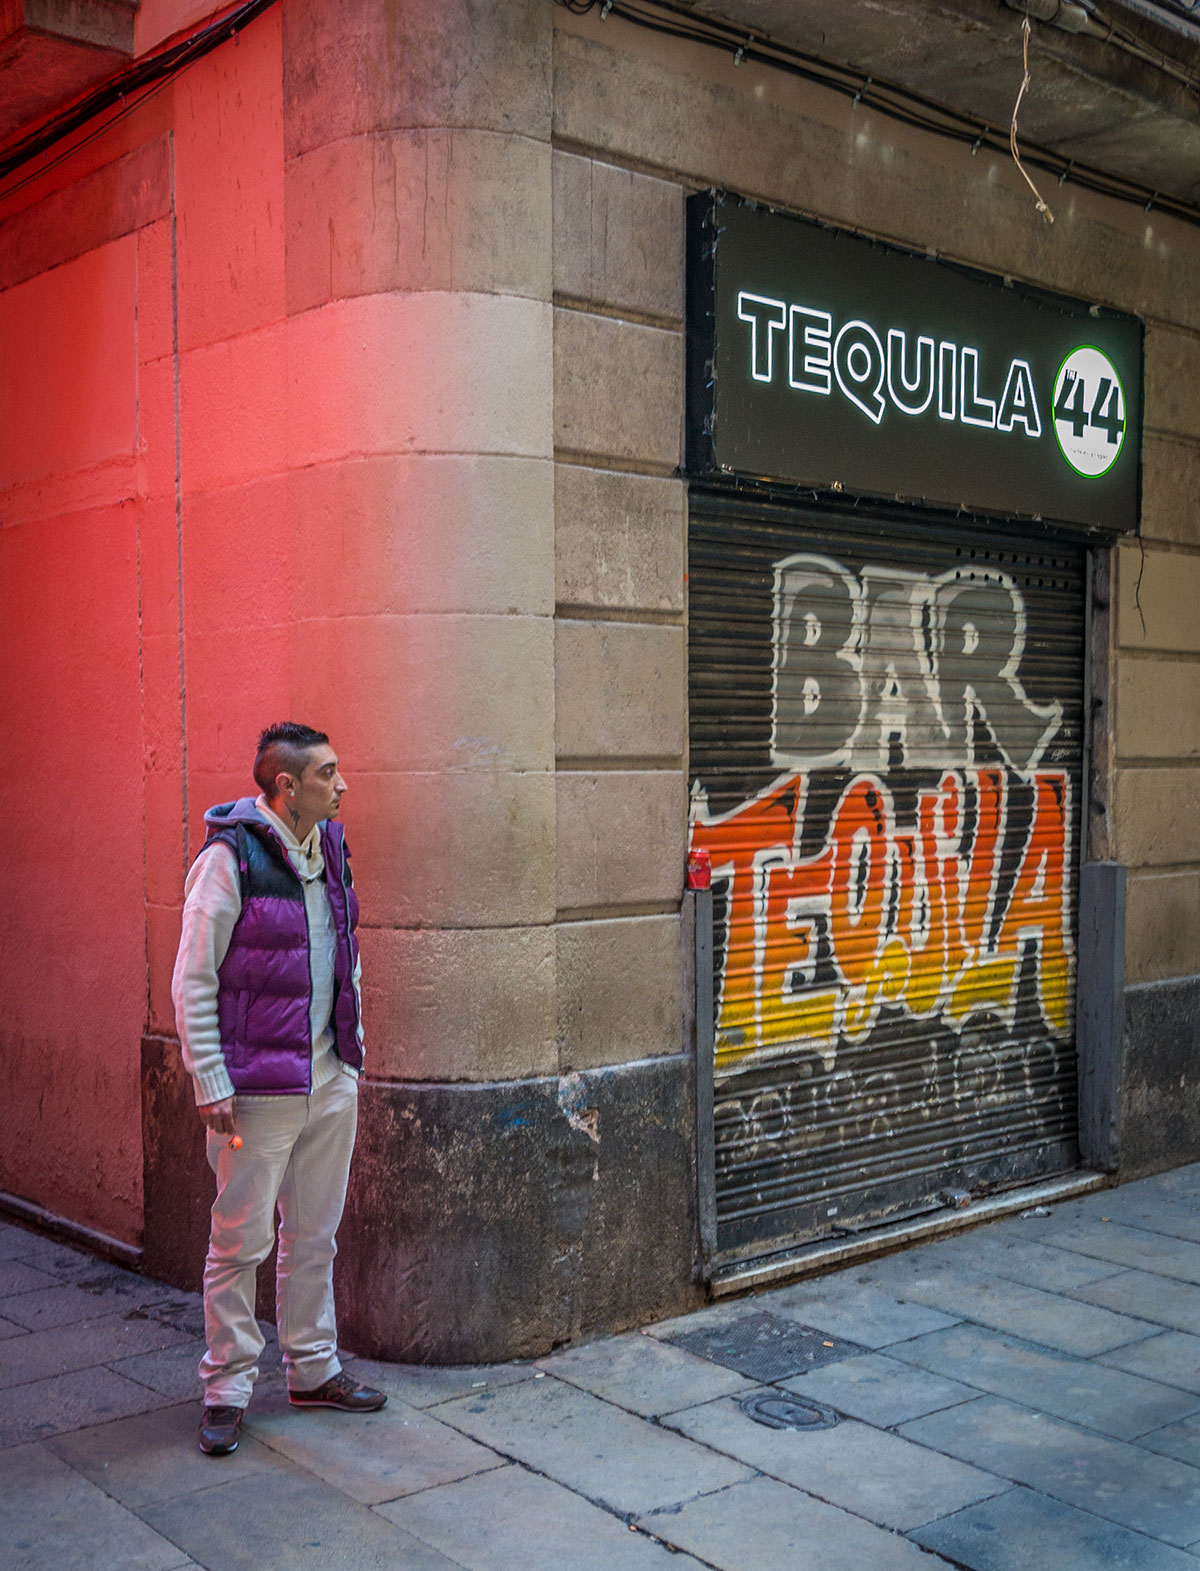 Barcelona - Barri Gotic - Tequila 44